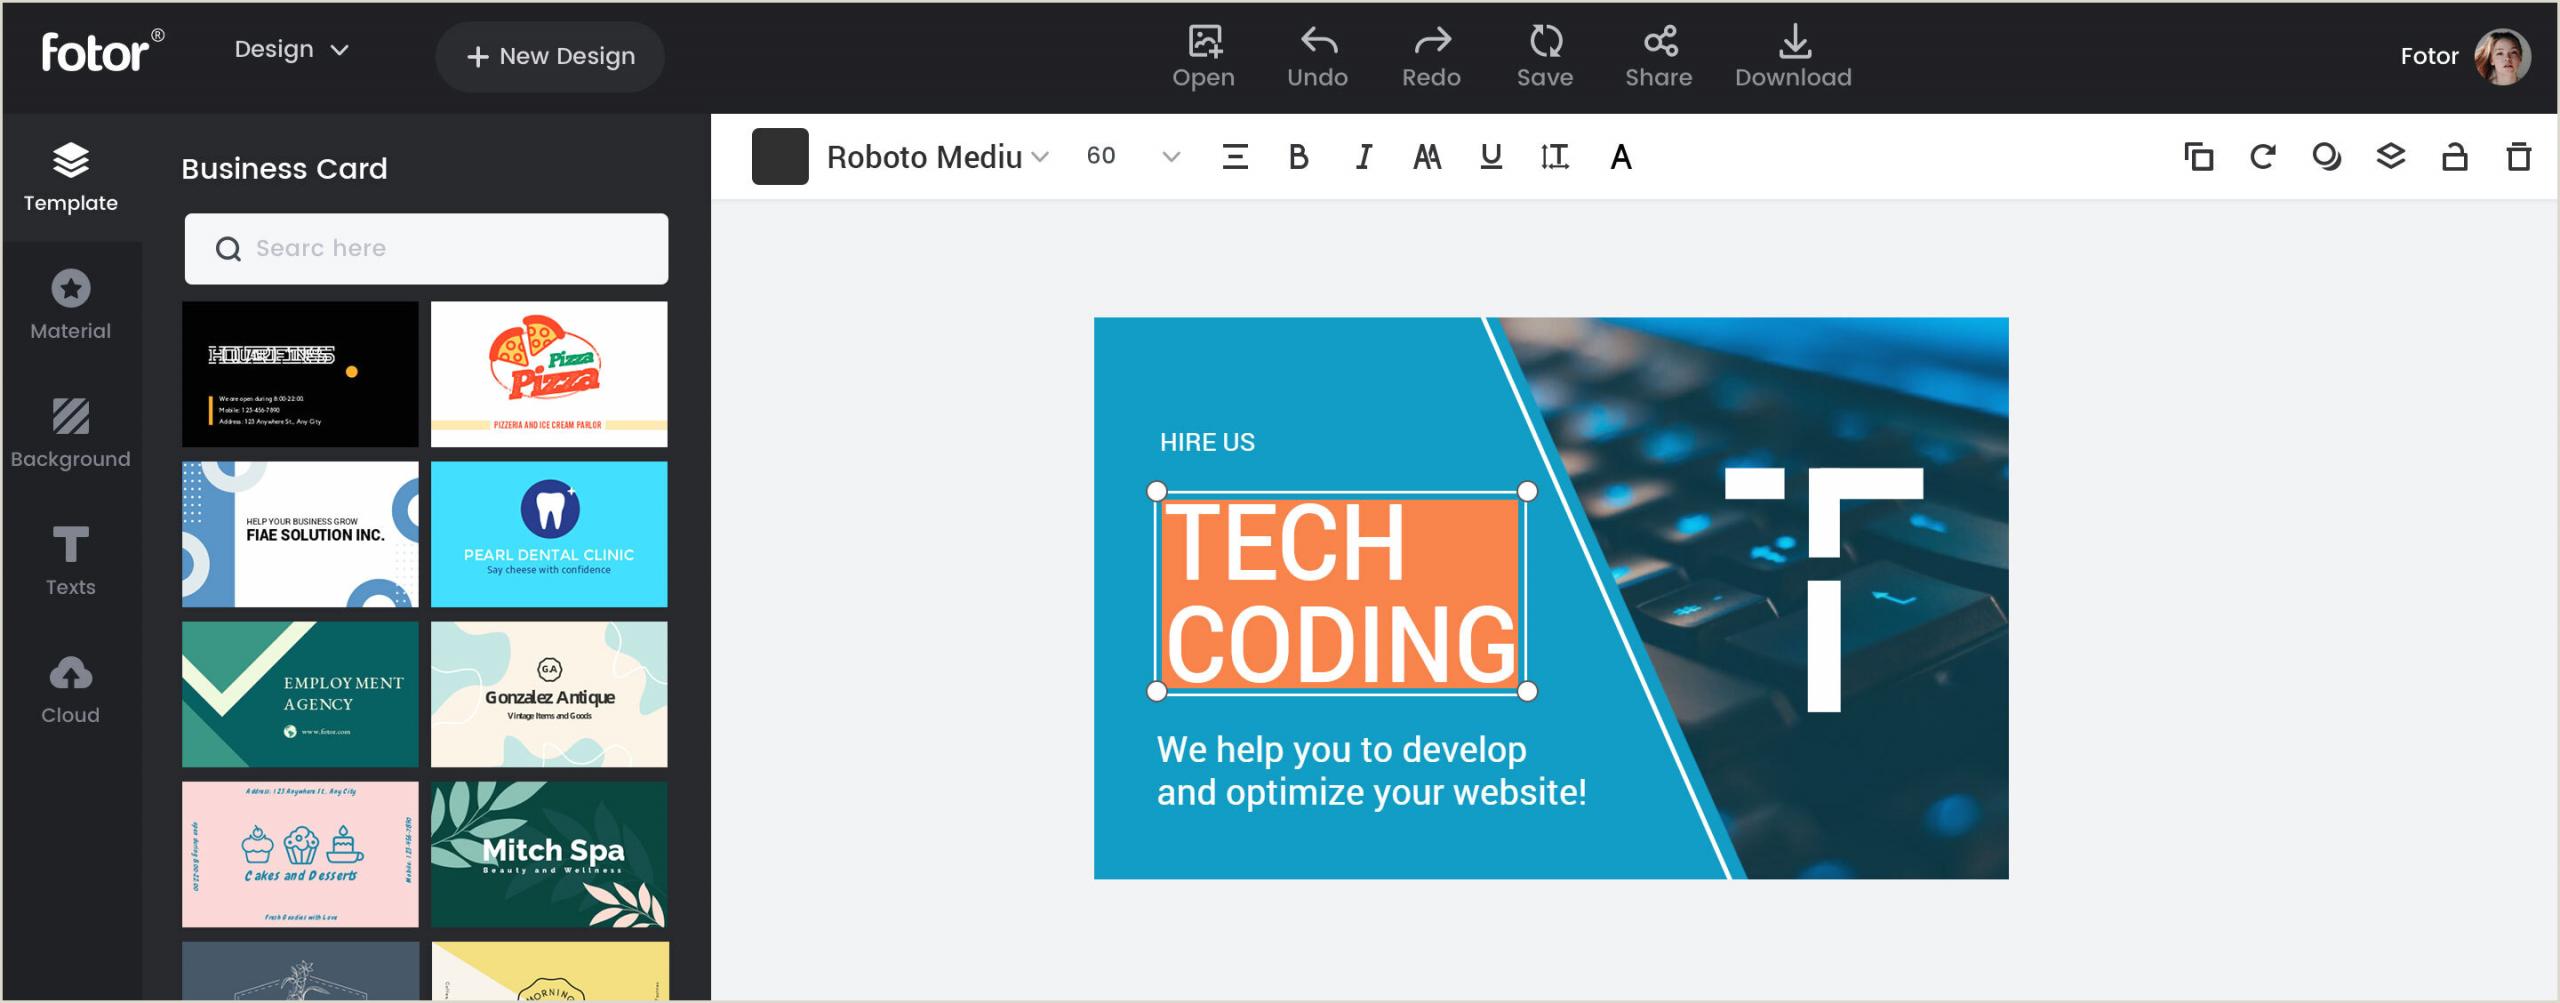 Online Visiting Card Design Business Card Maker Create Business Card Designs Line For